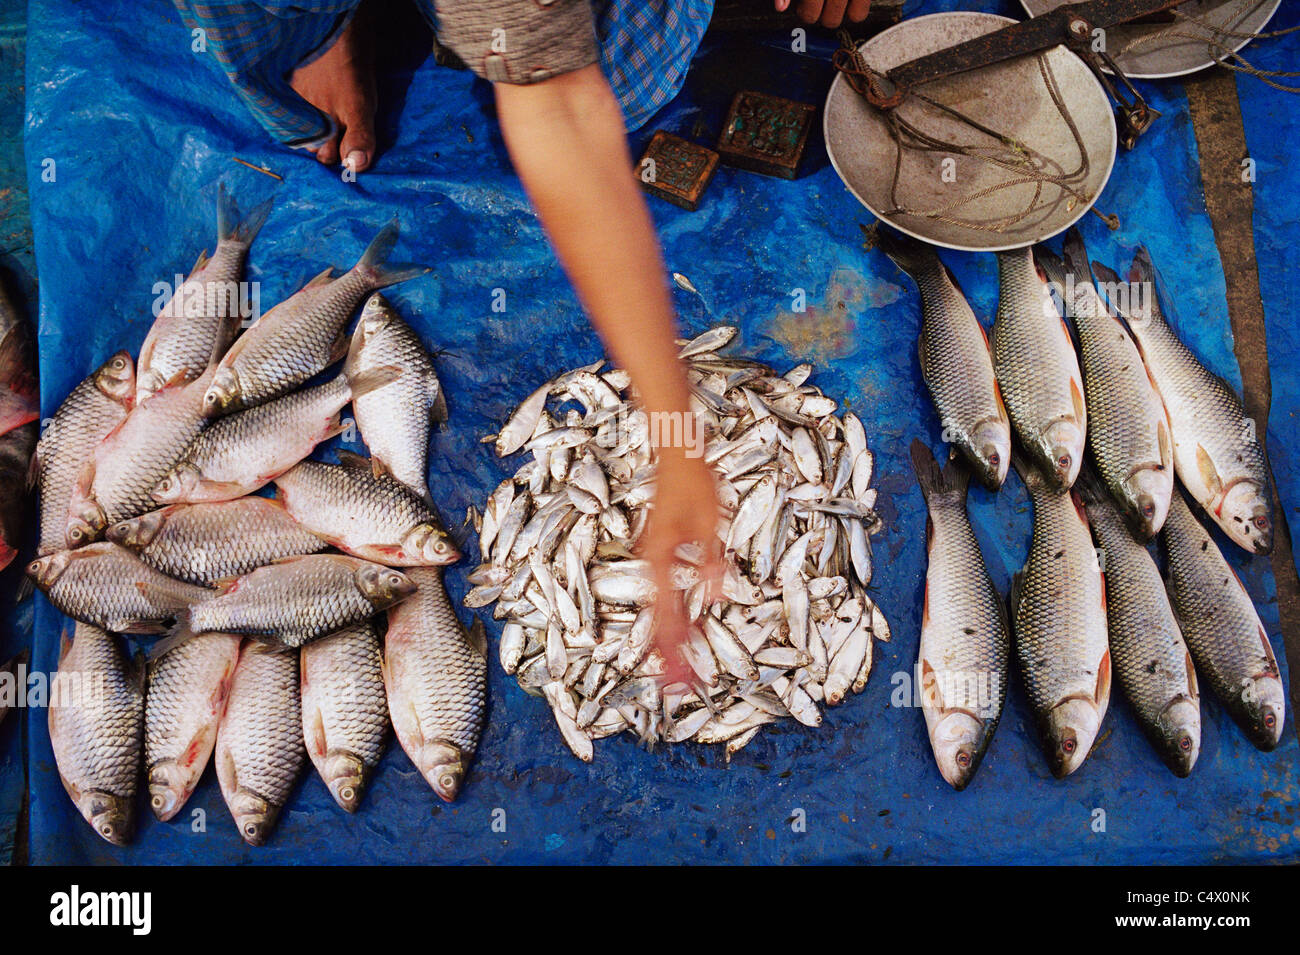 Fish market, Bhatiary, Bangladesh - Stock Image